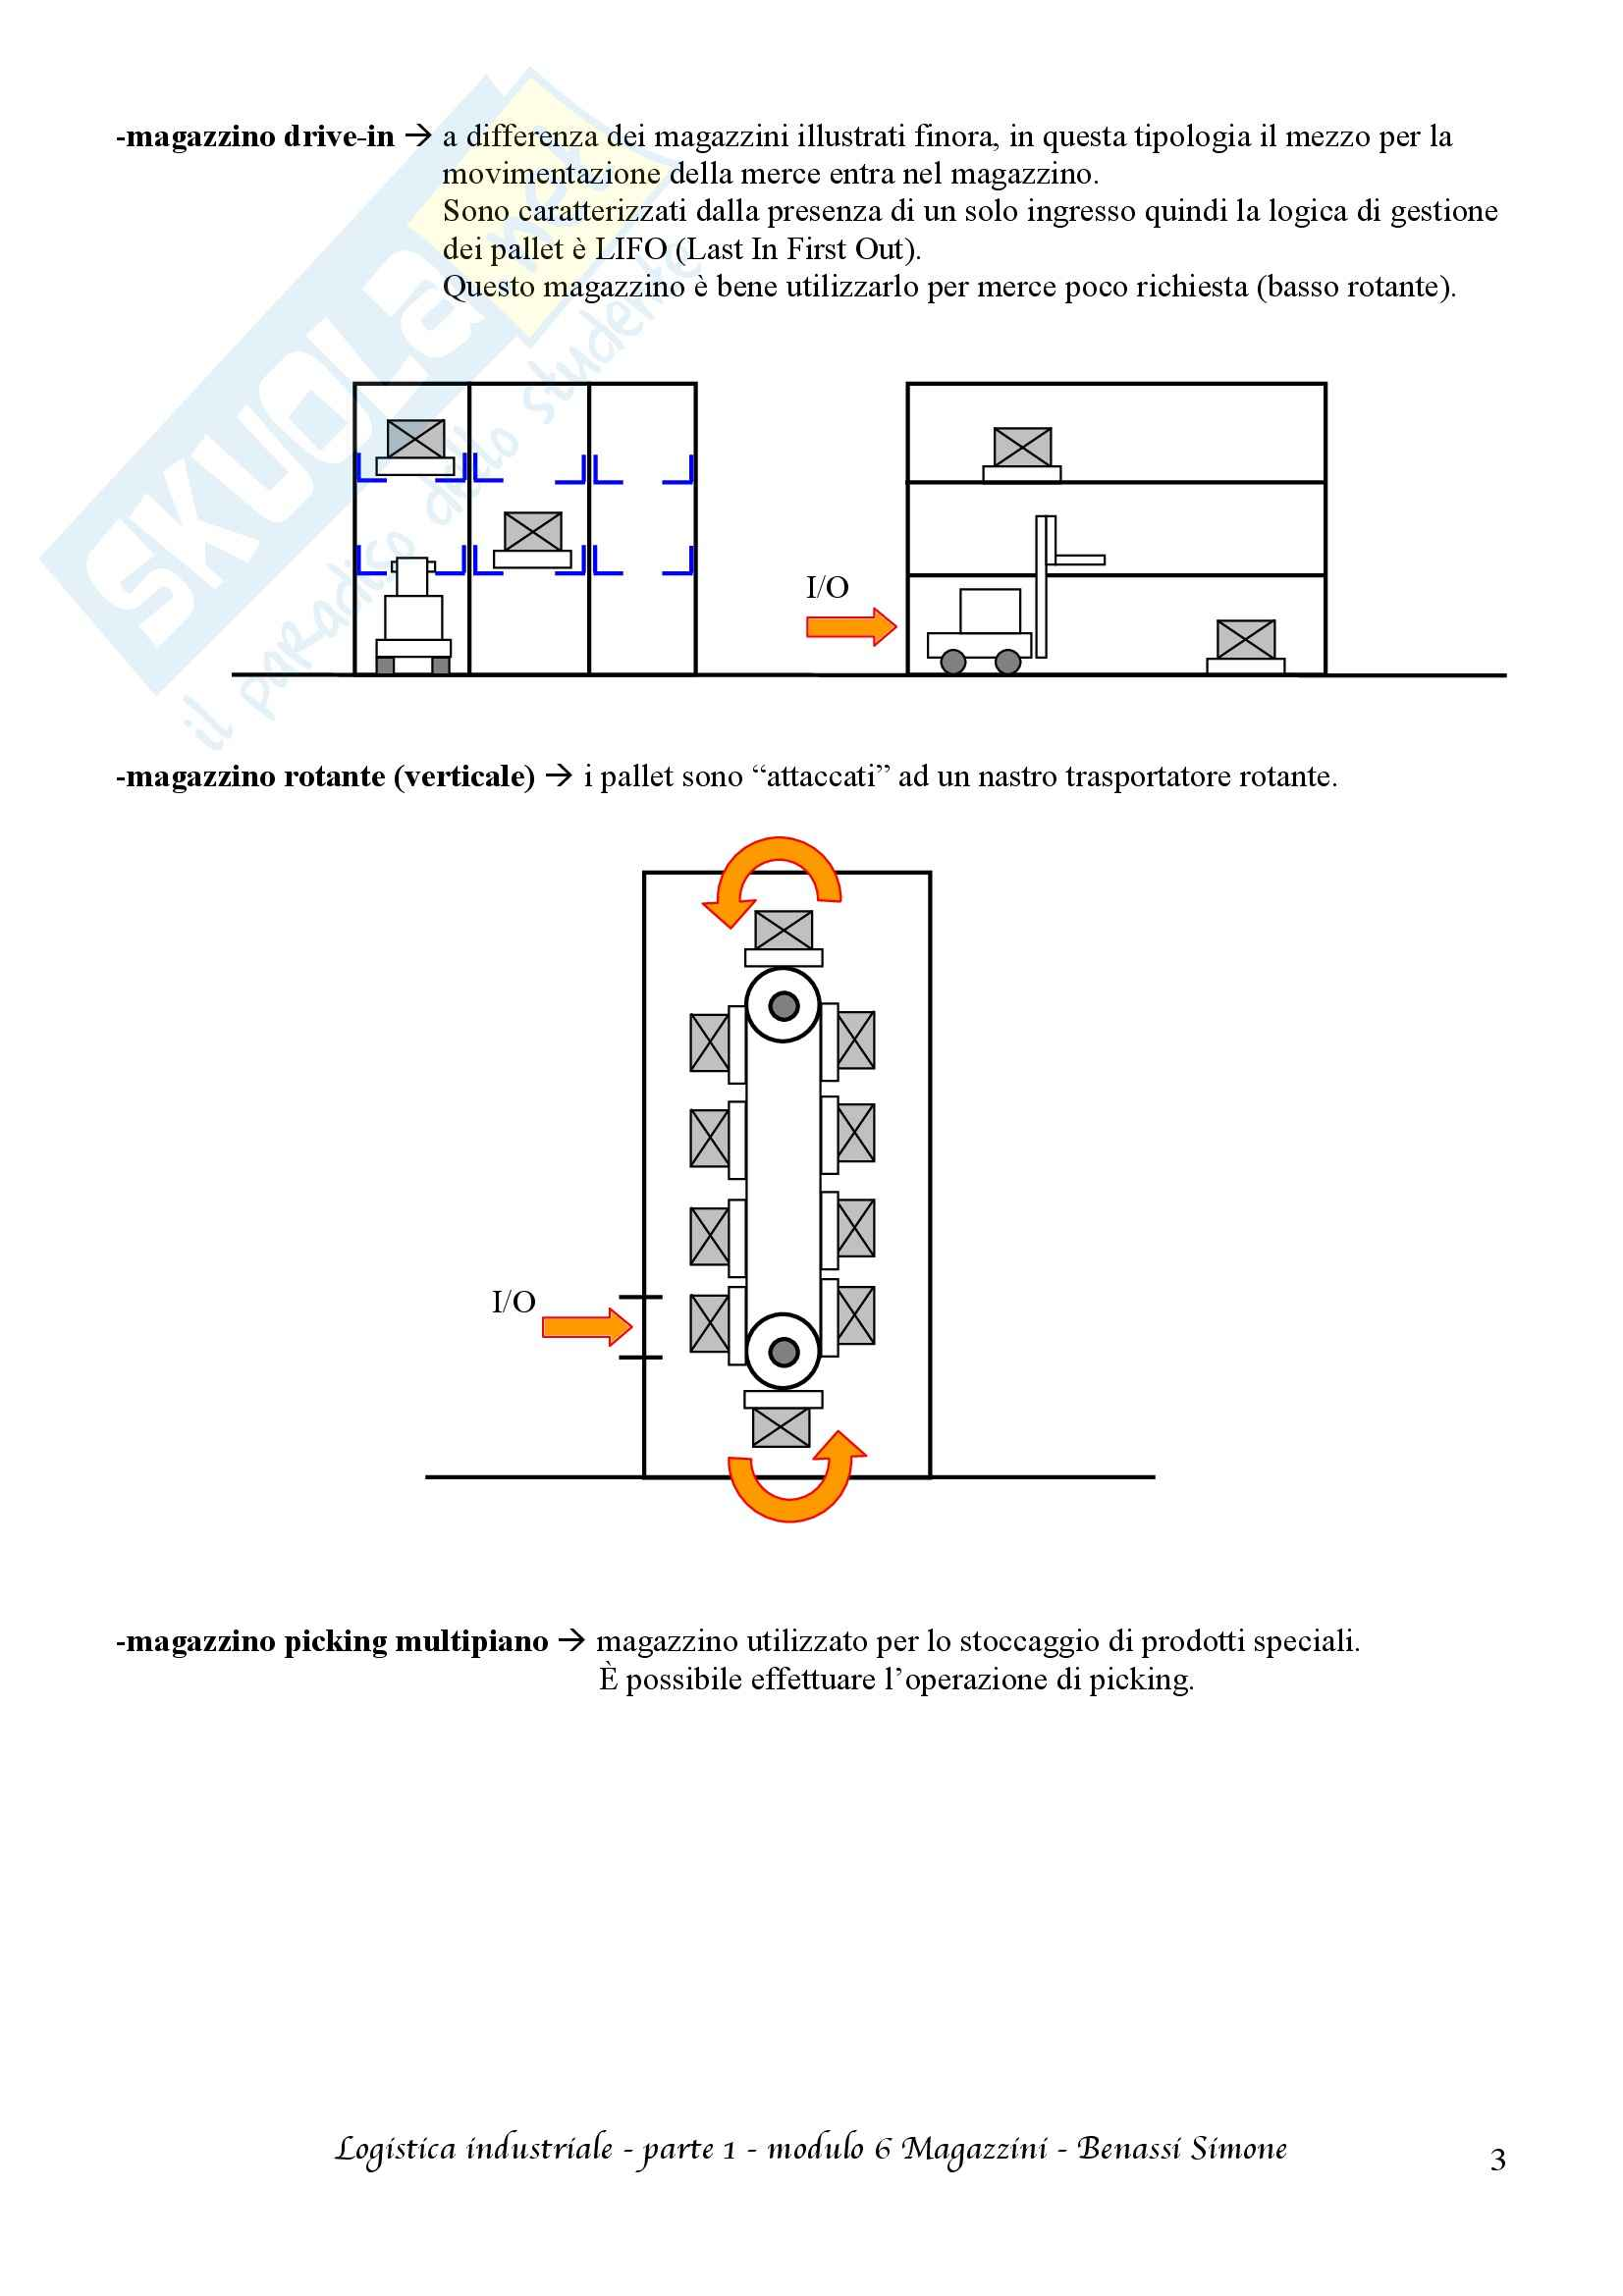 Logistica industriale T-AB - Appunti prima parte Pag. 36